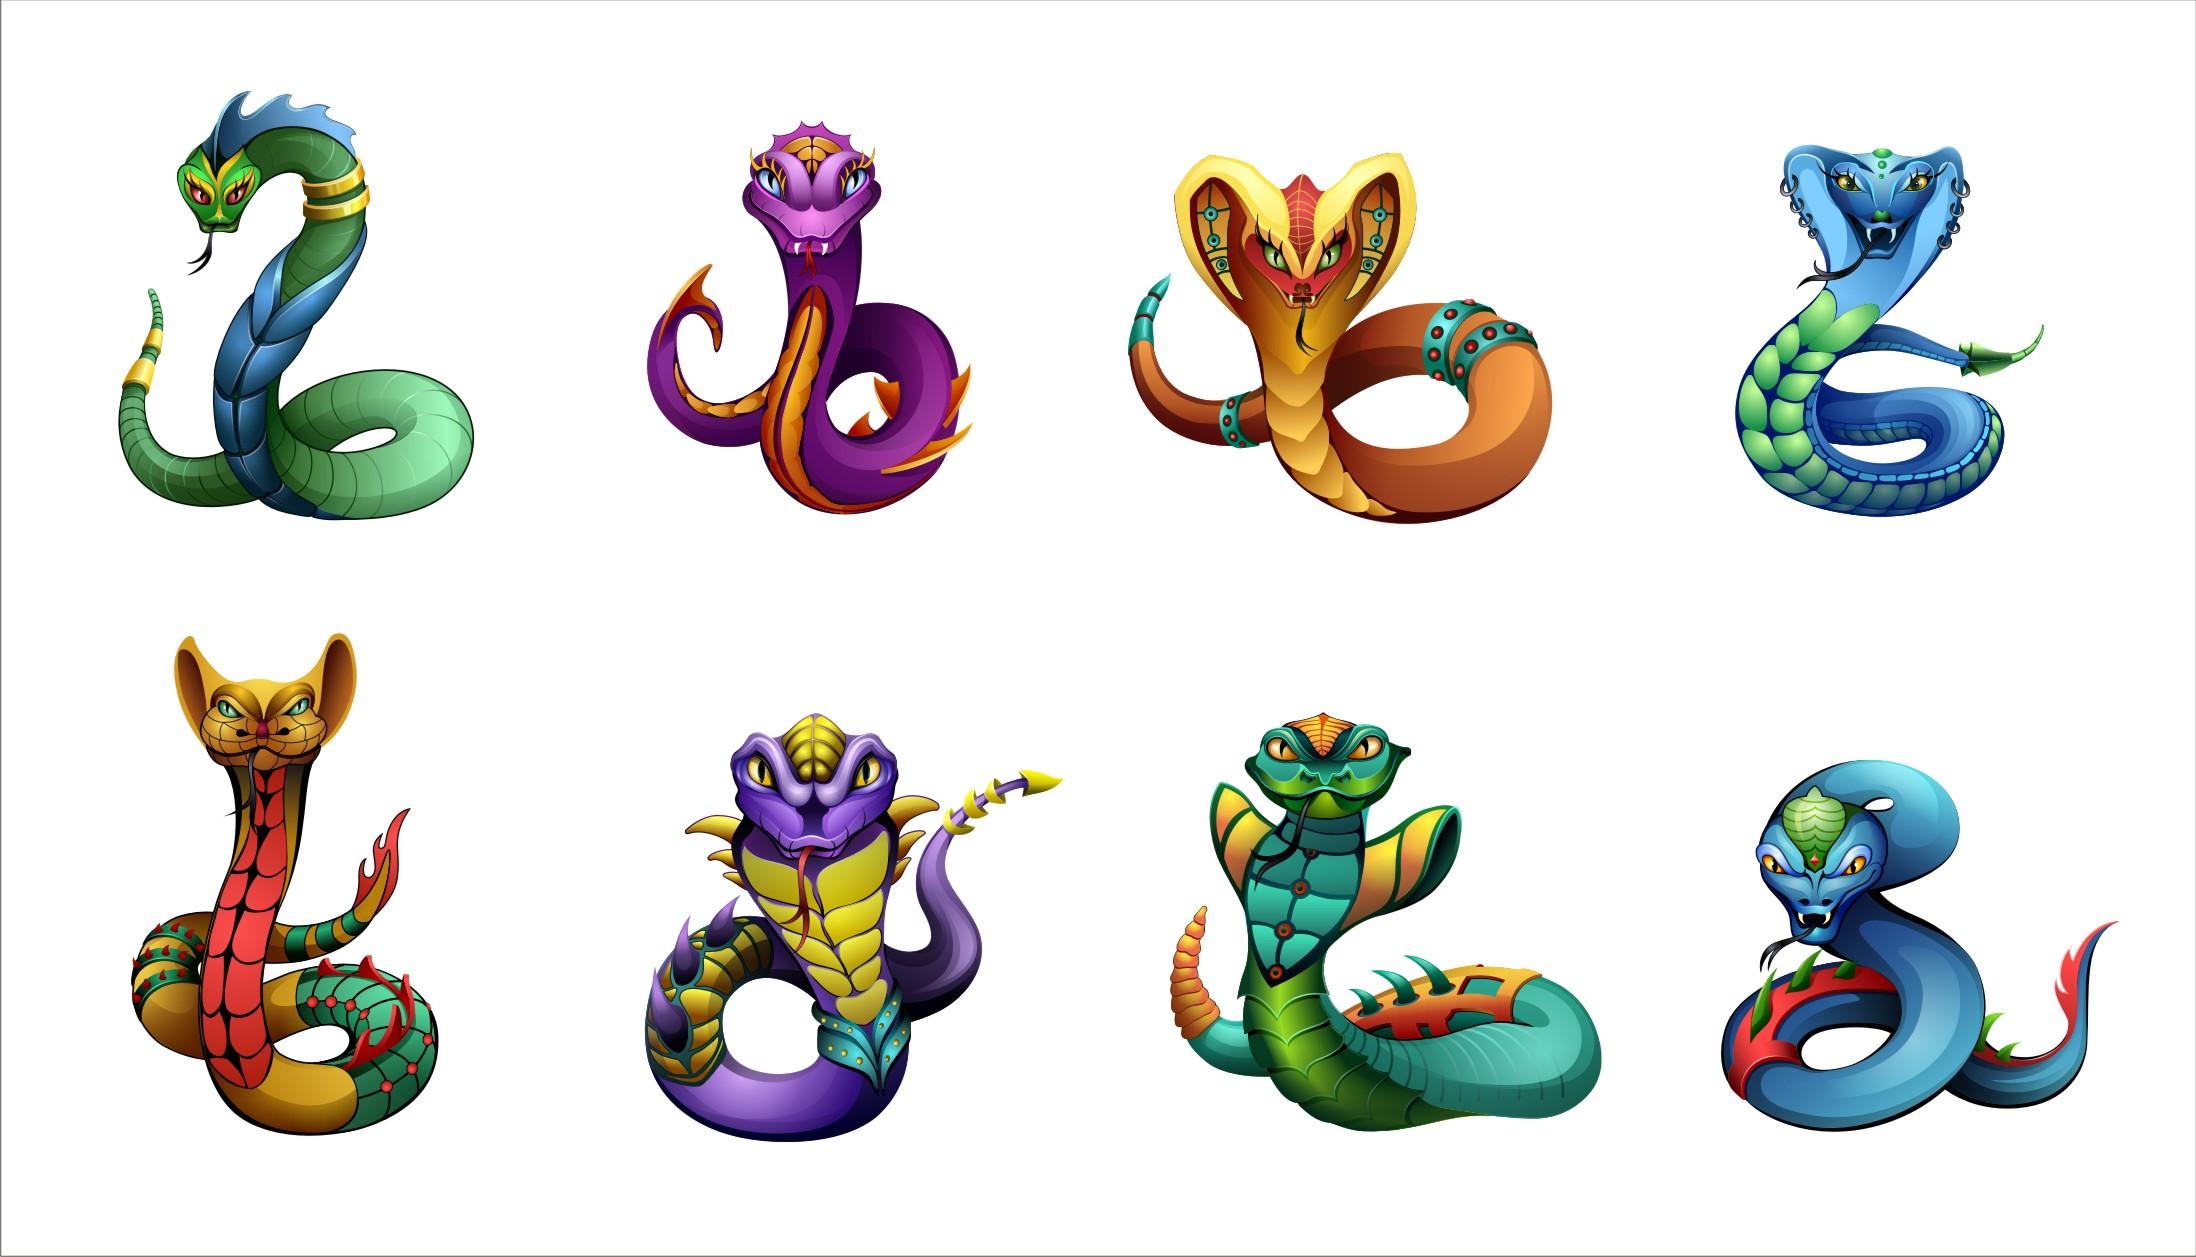 Персонажи Змеи. (вектор)